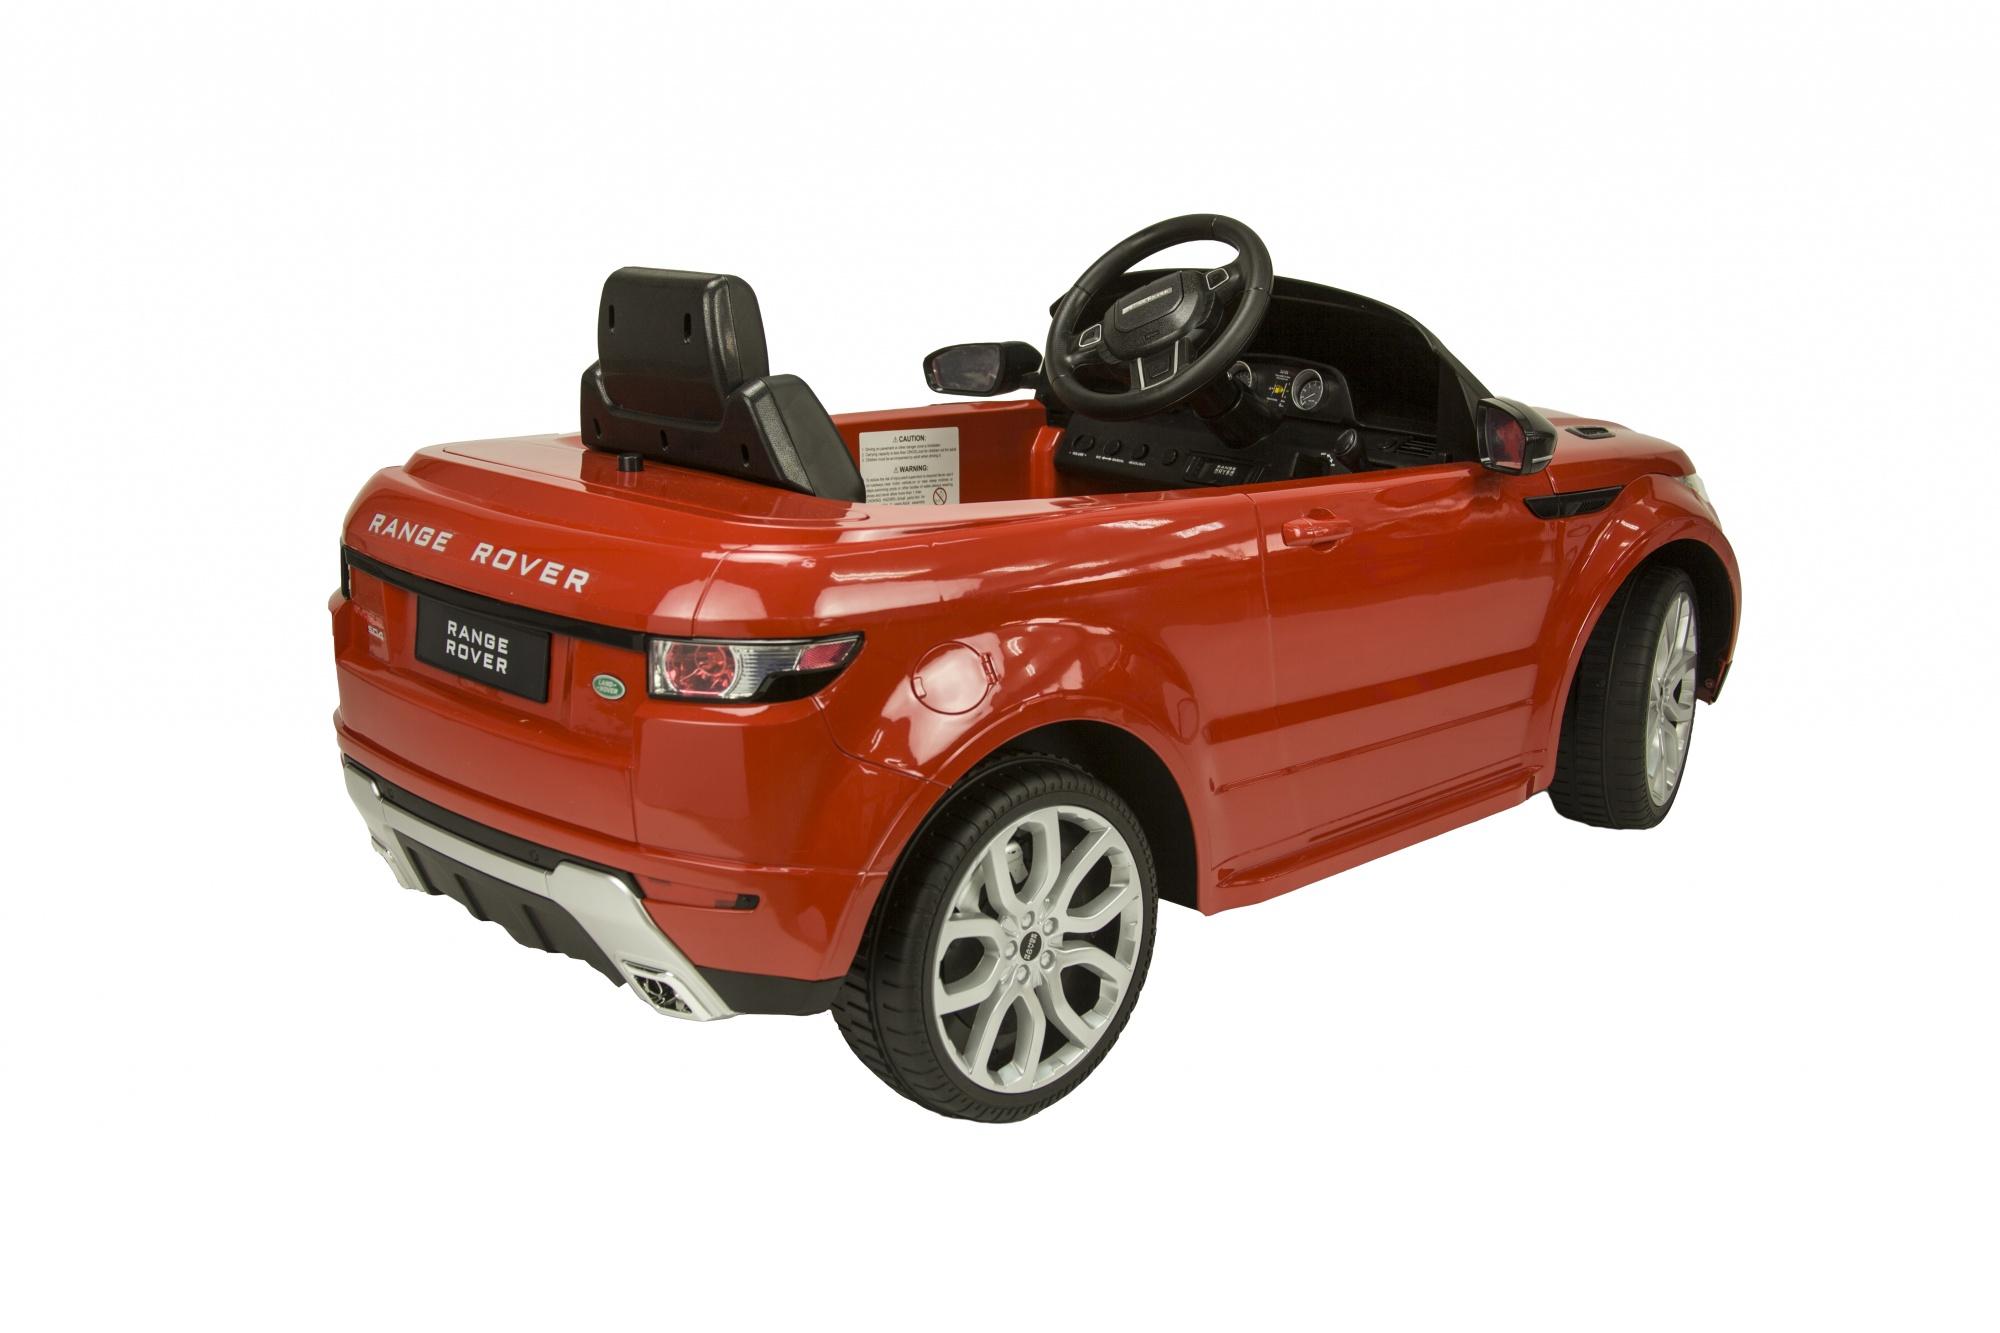 Runruntoys Land Rover Evoque Battery Vehicle 12 Volt R C Red